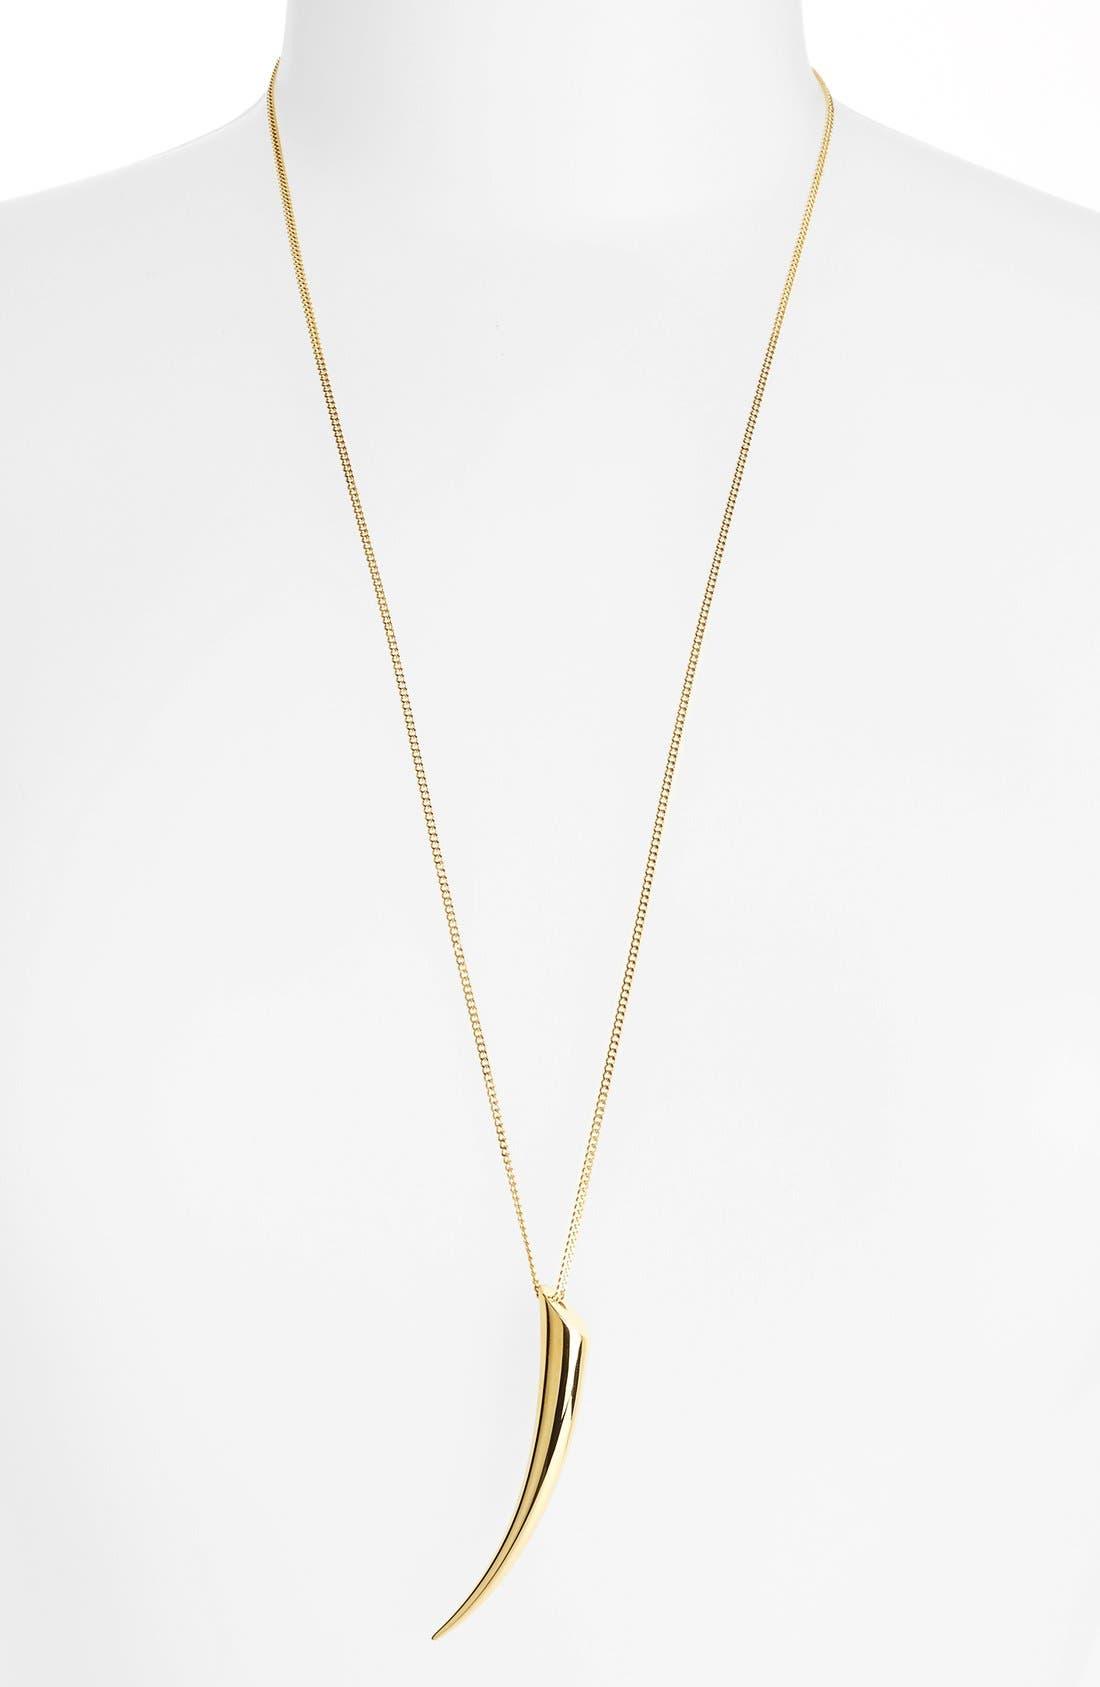 Alternate Image 1 Selected - Michael Kors Horn Pendant Necklace